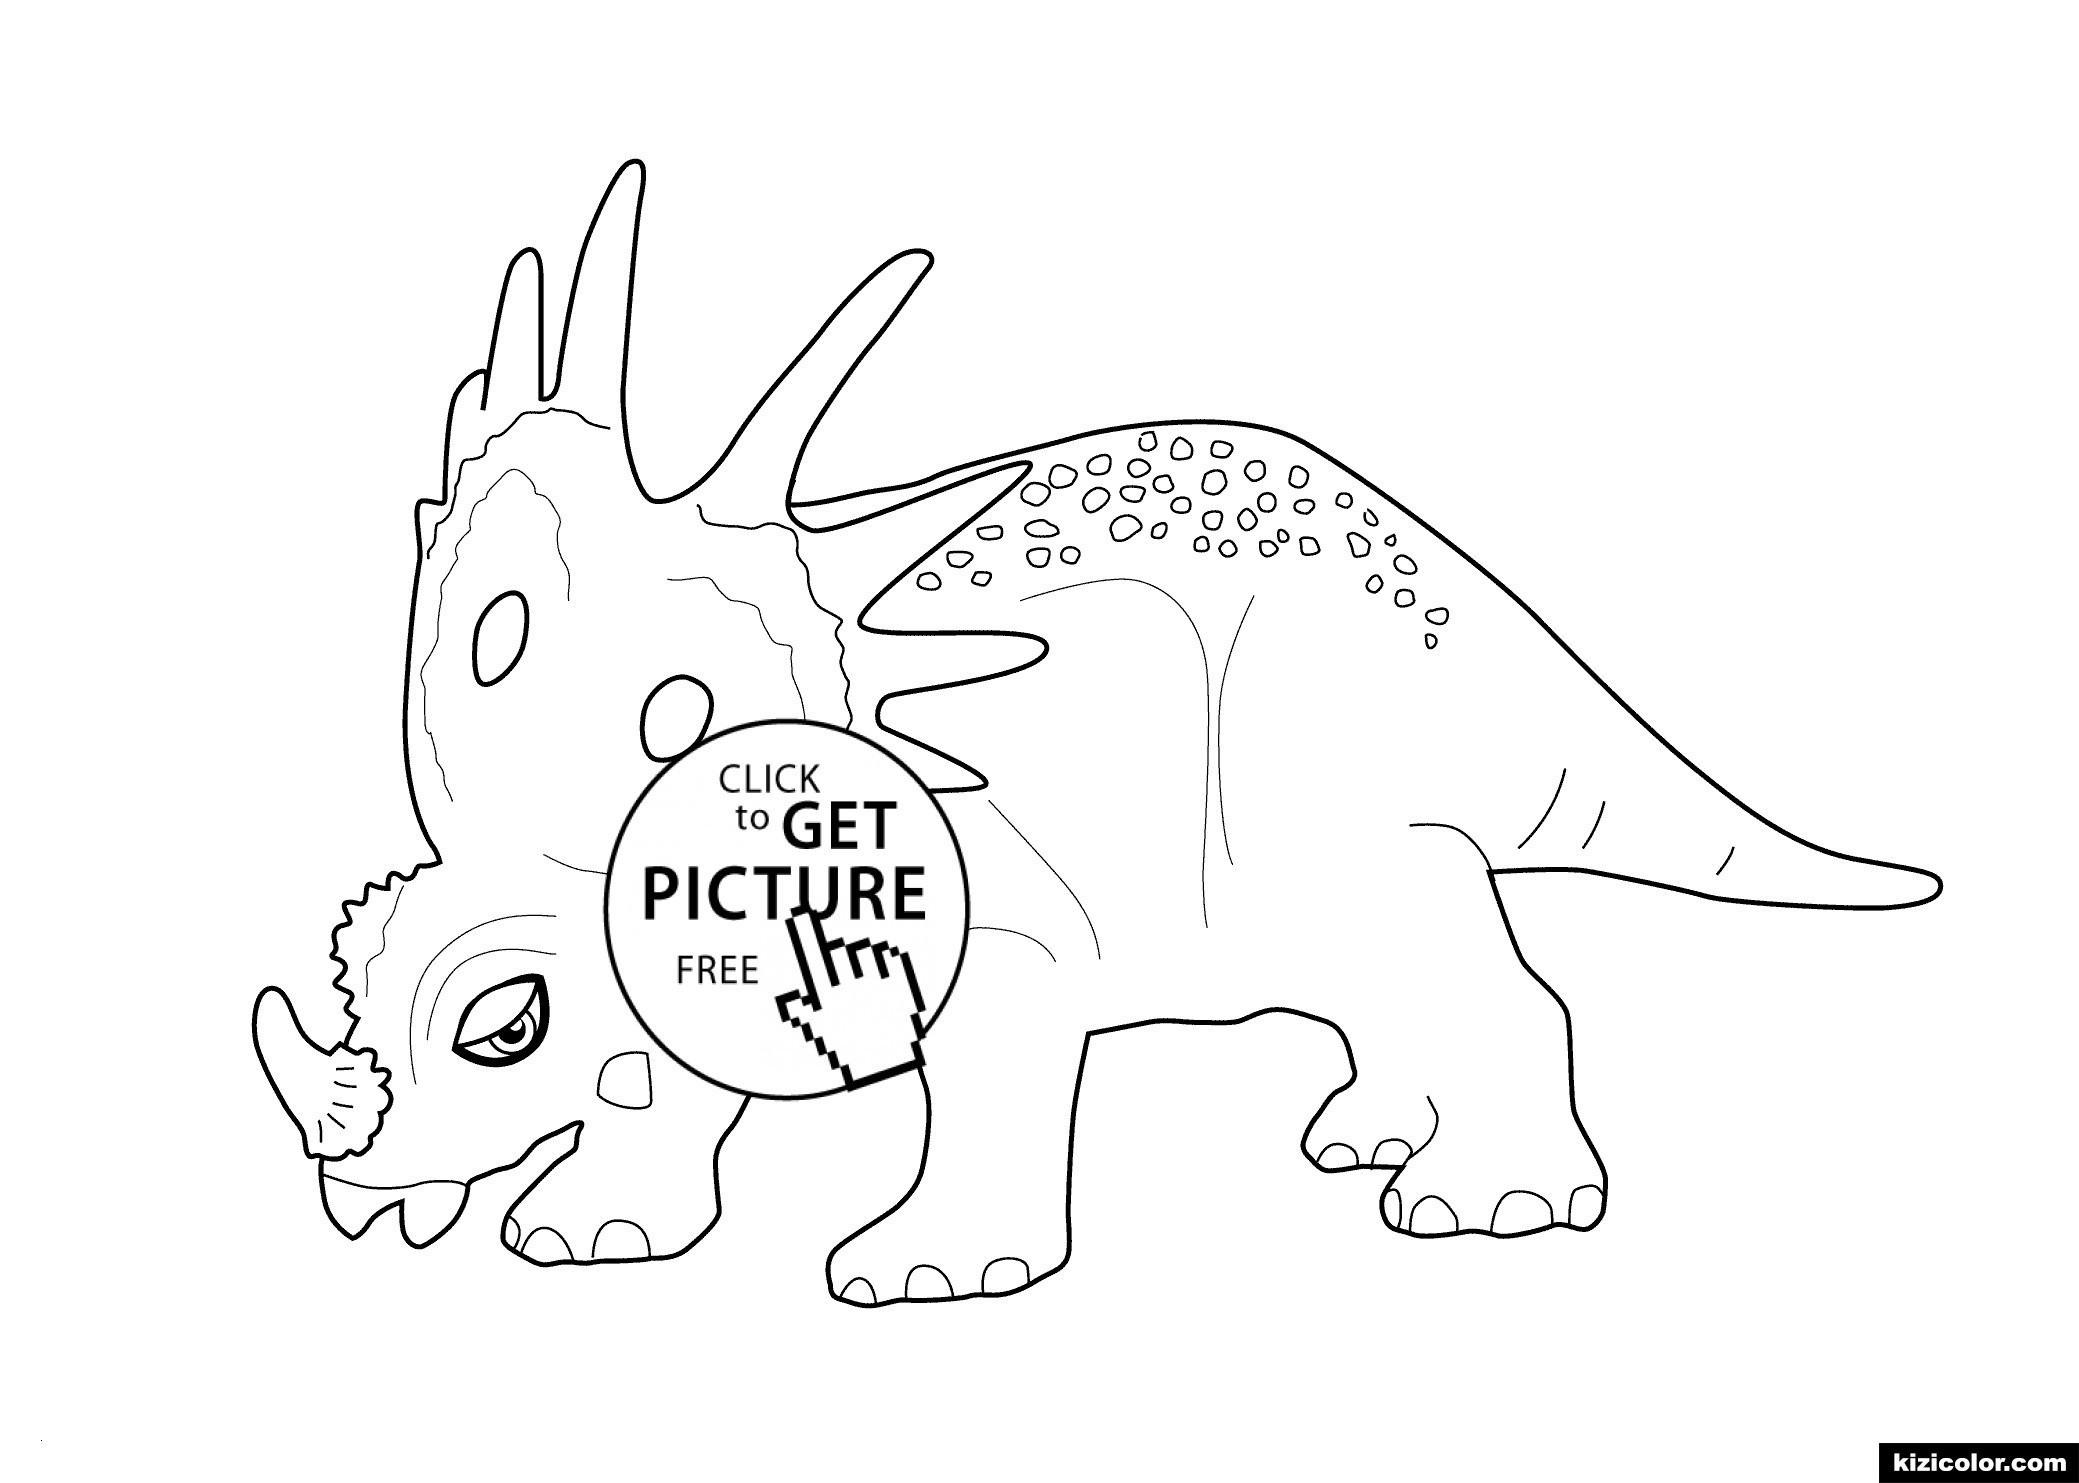 Ausmalbild T-rex Neu 35 T Rex Ausmalbilder Scoredatscore Einzigartig Dinosaurier Rex Fotografieren